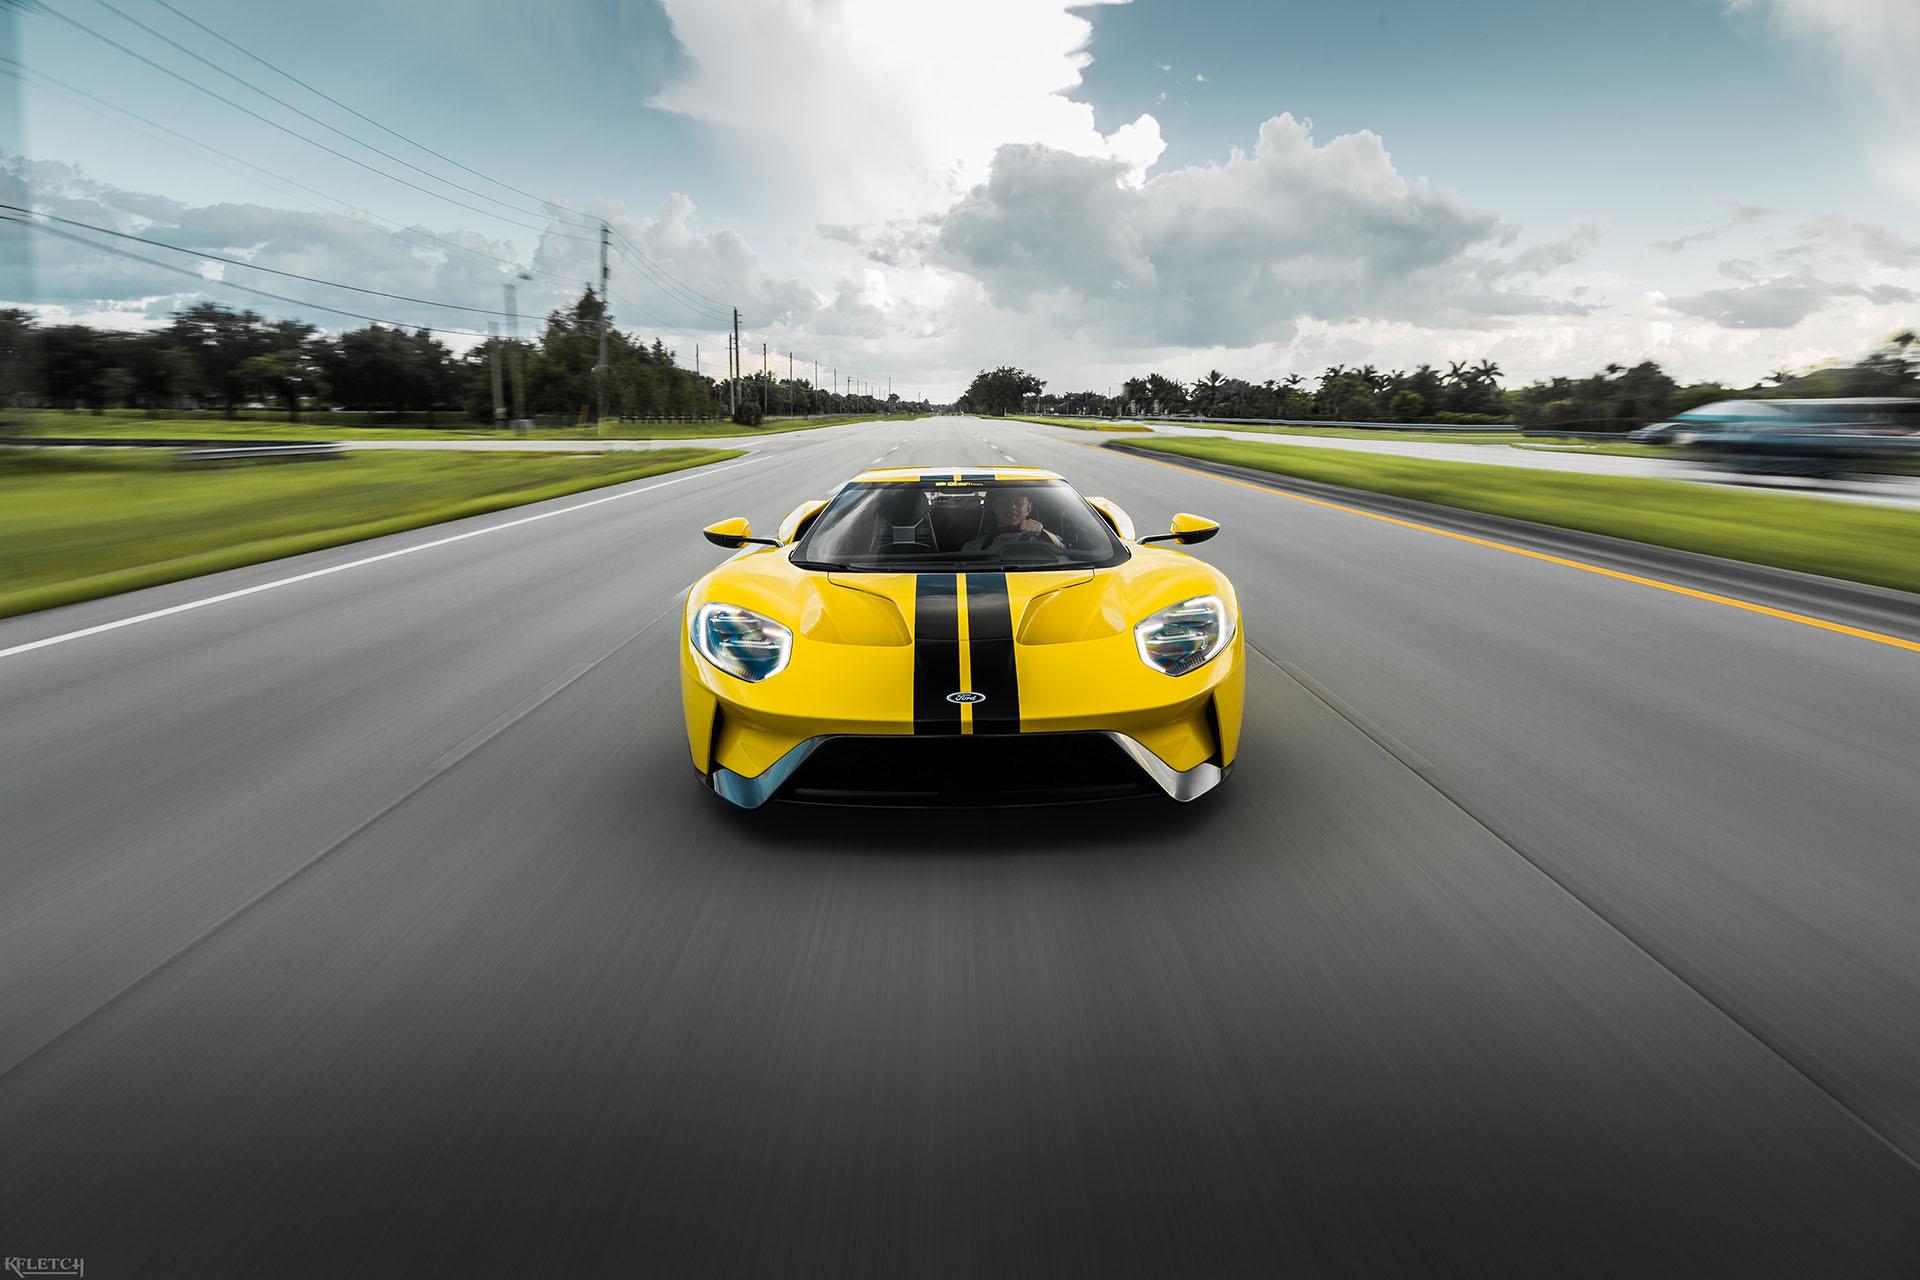 2018-Ford-GT-DragtTimes-rolling-04.jpg